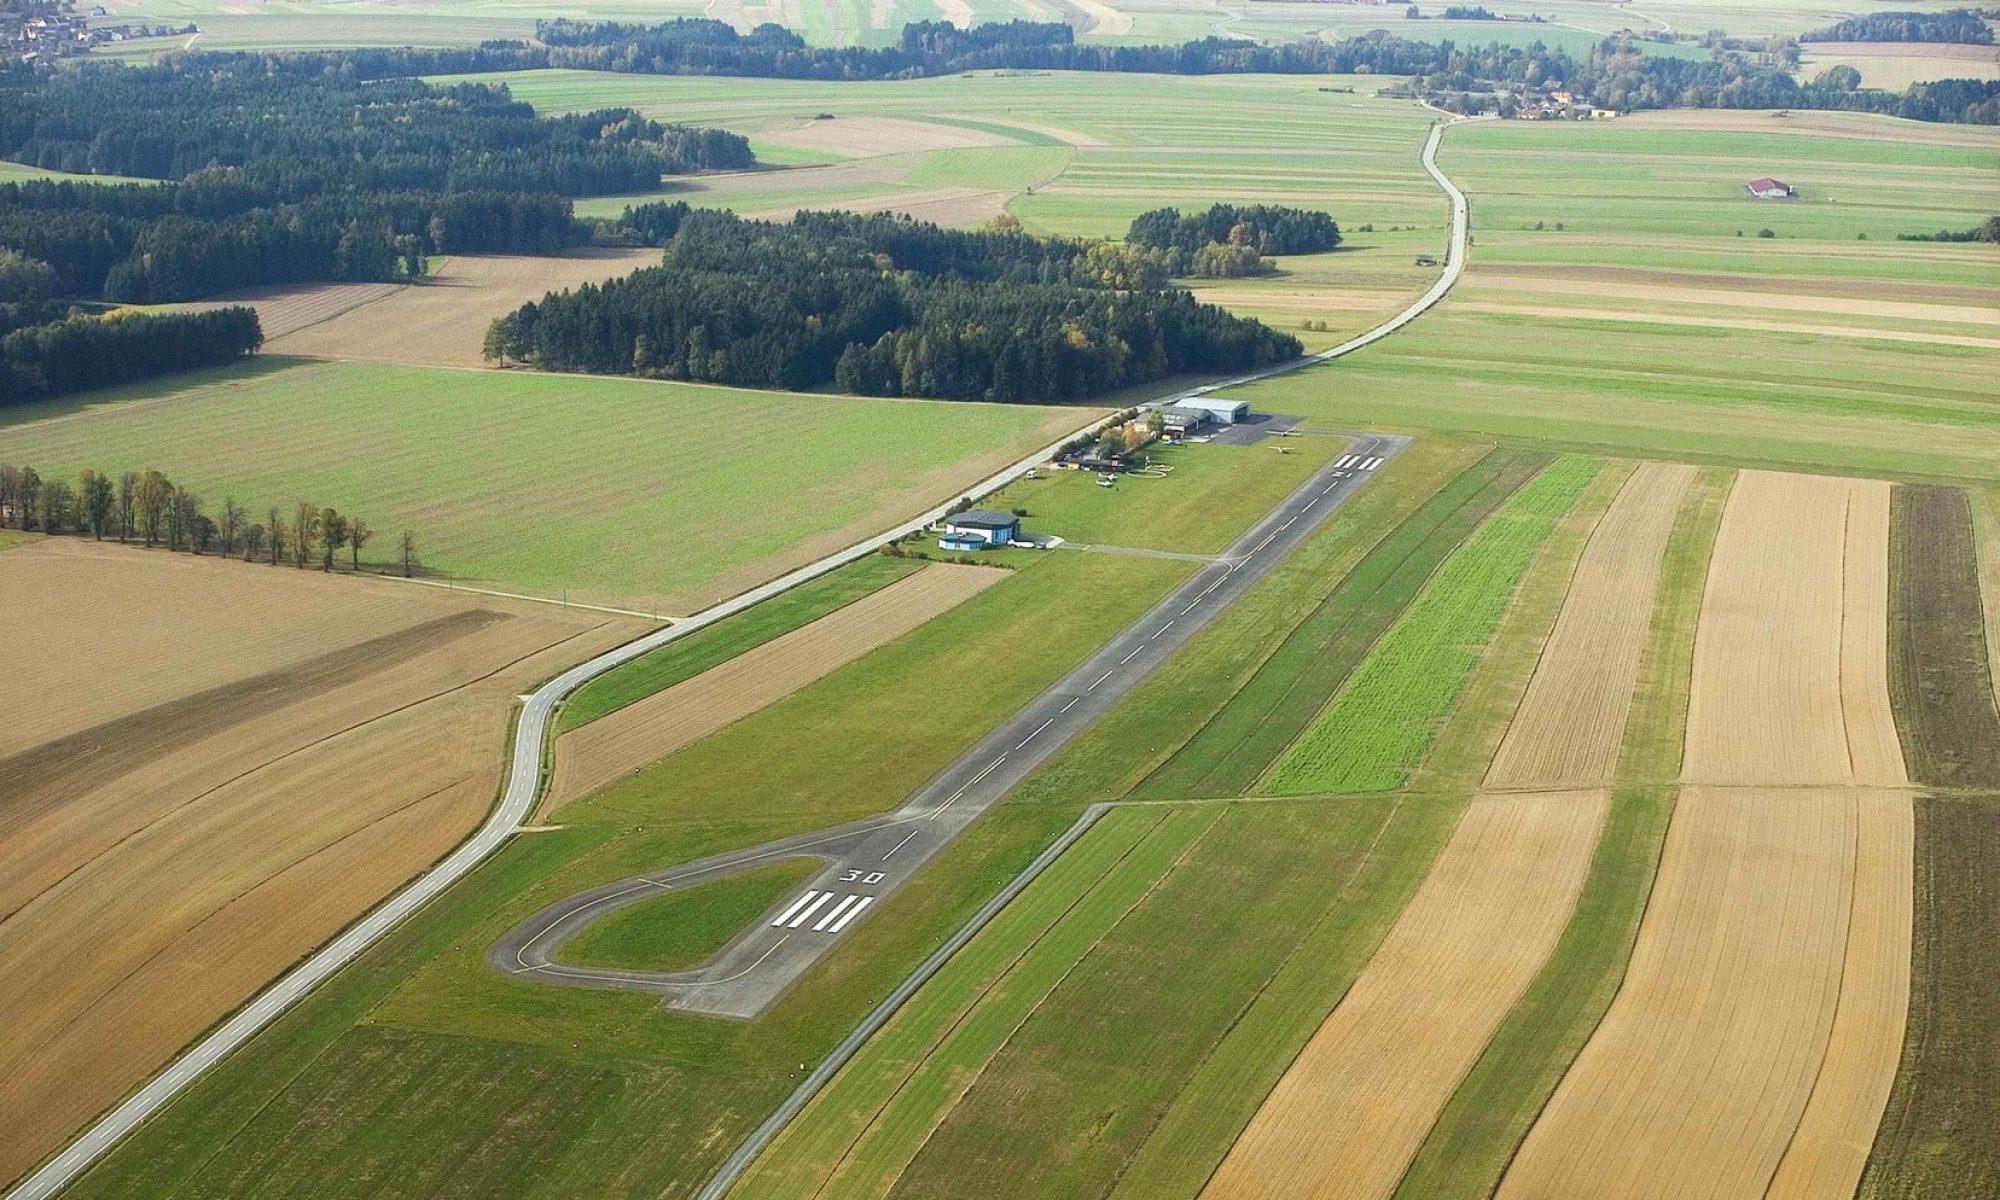 LOAB - Flugplatz Dobersberg